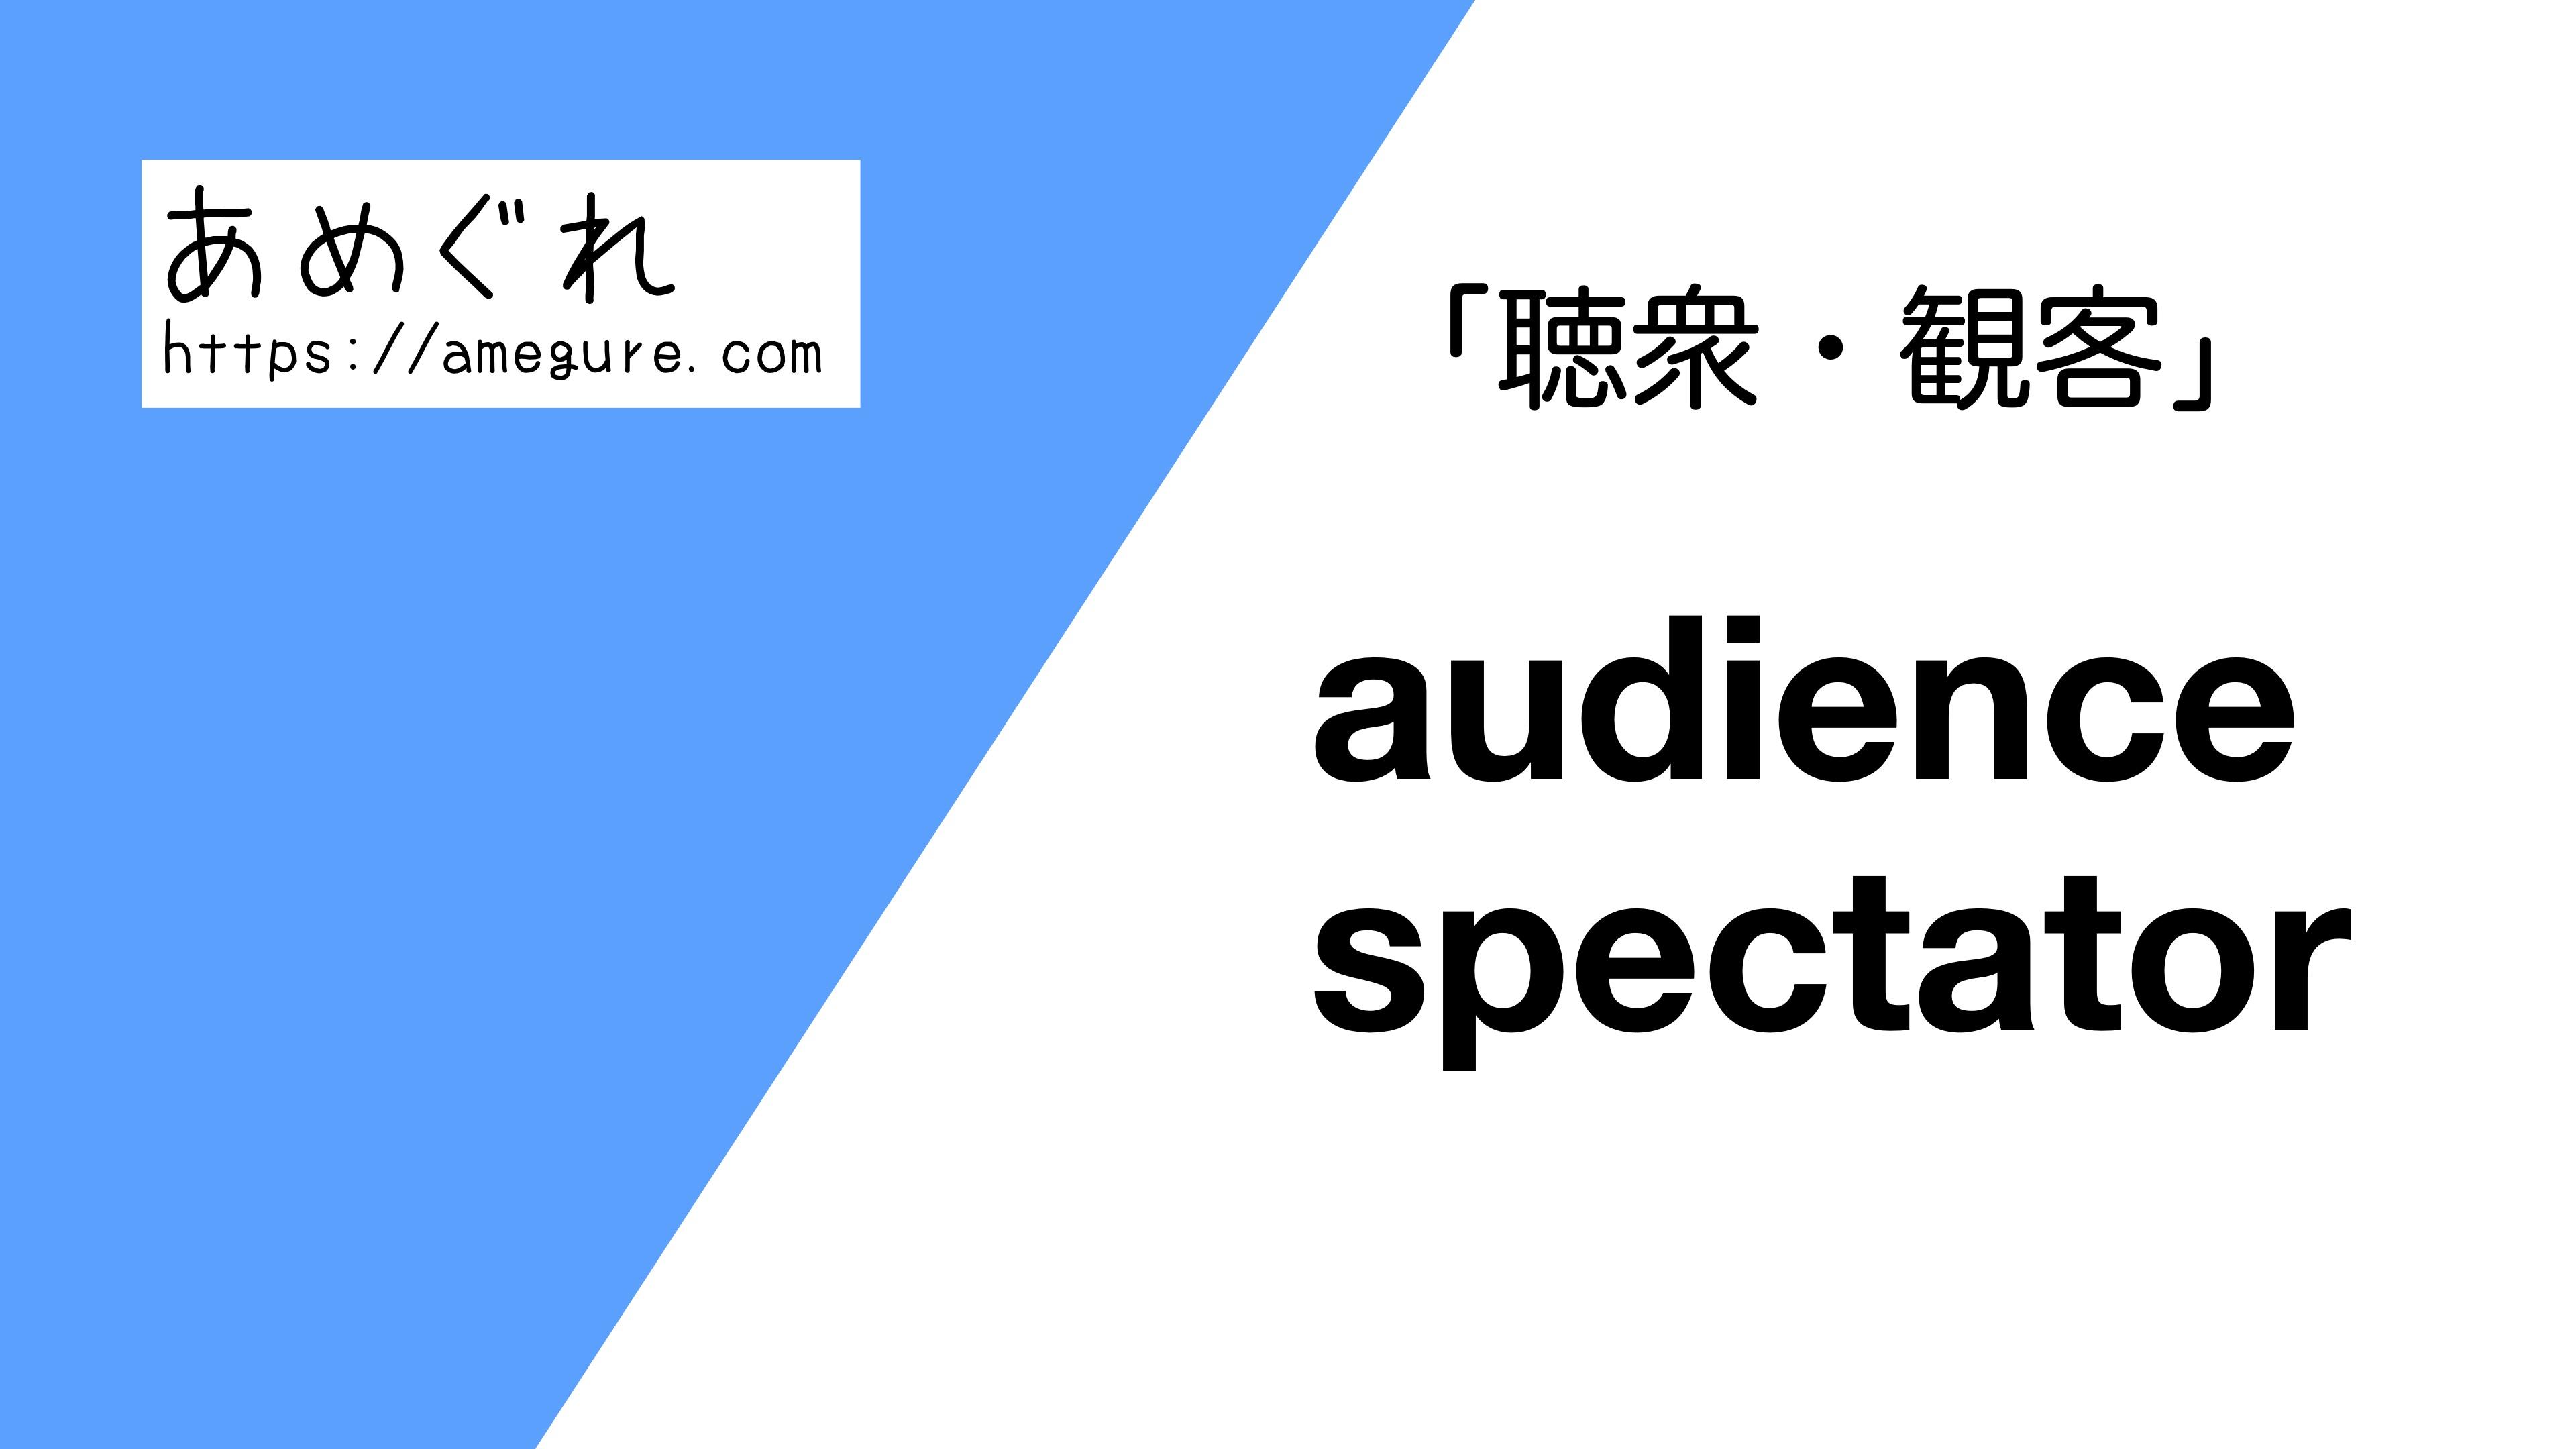 audience-spectator違い